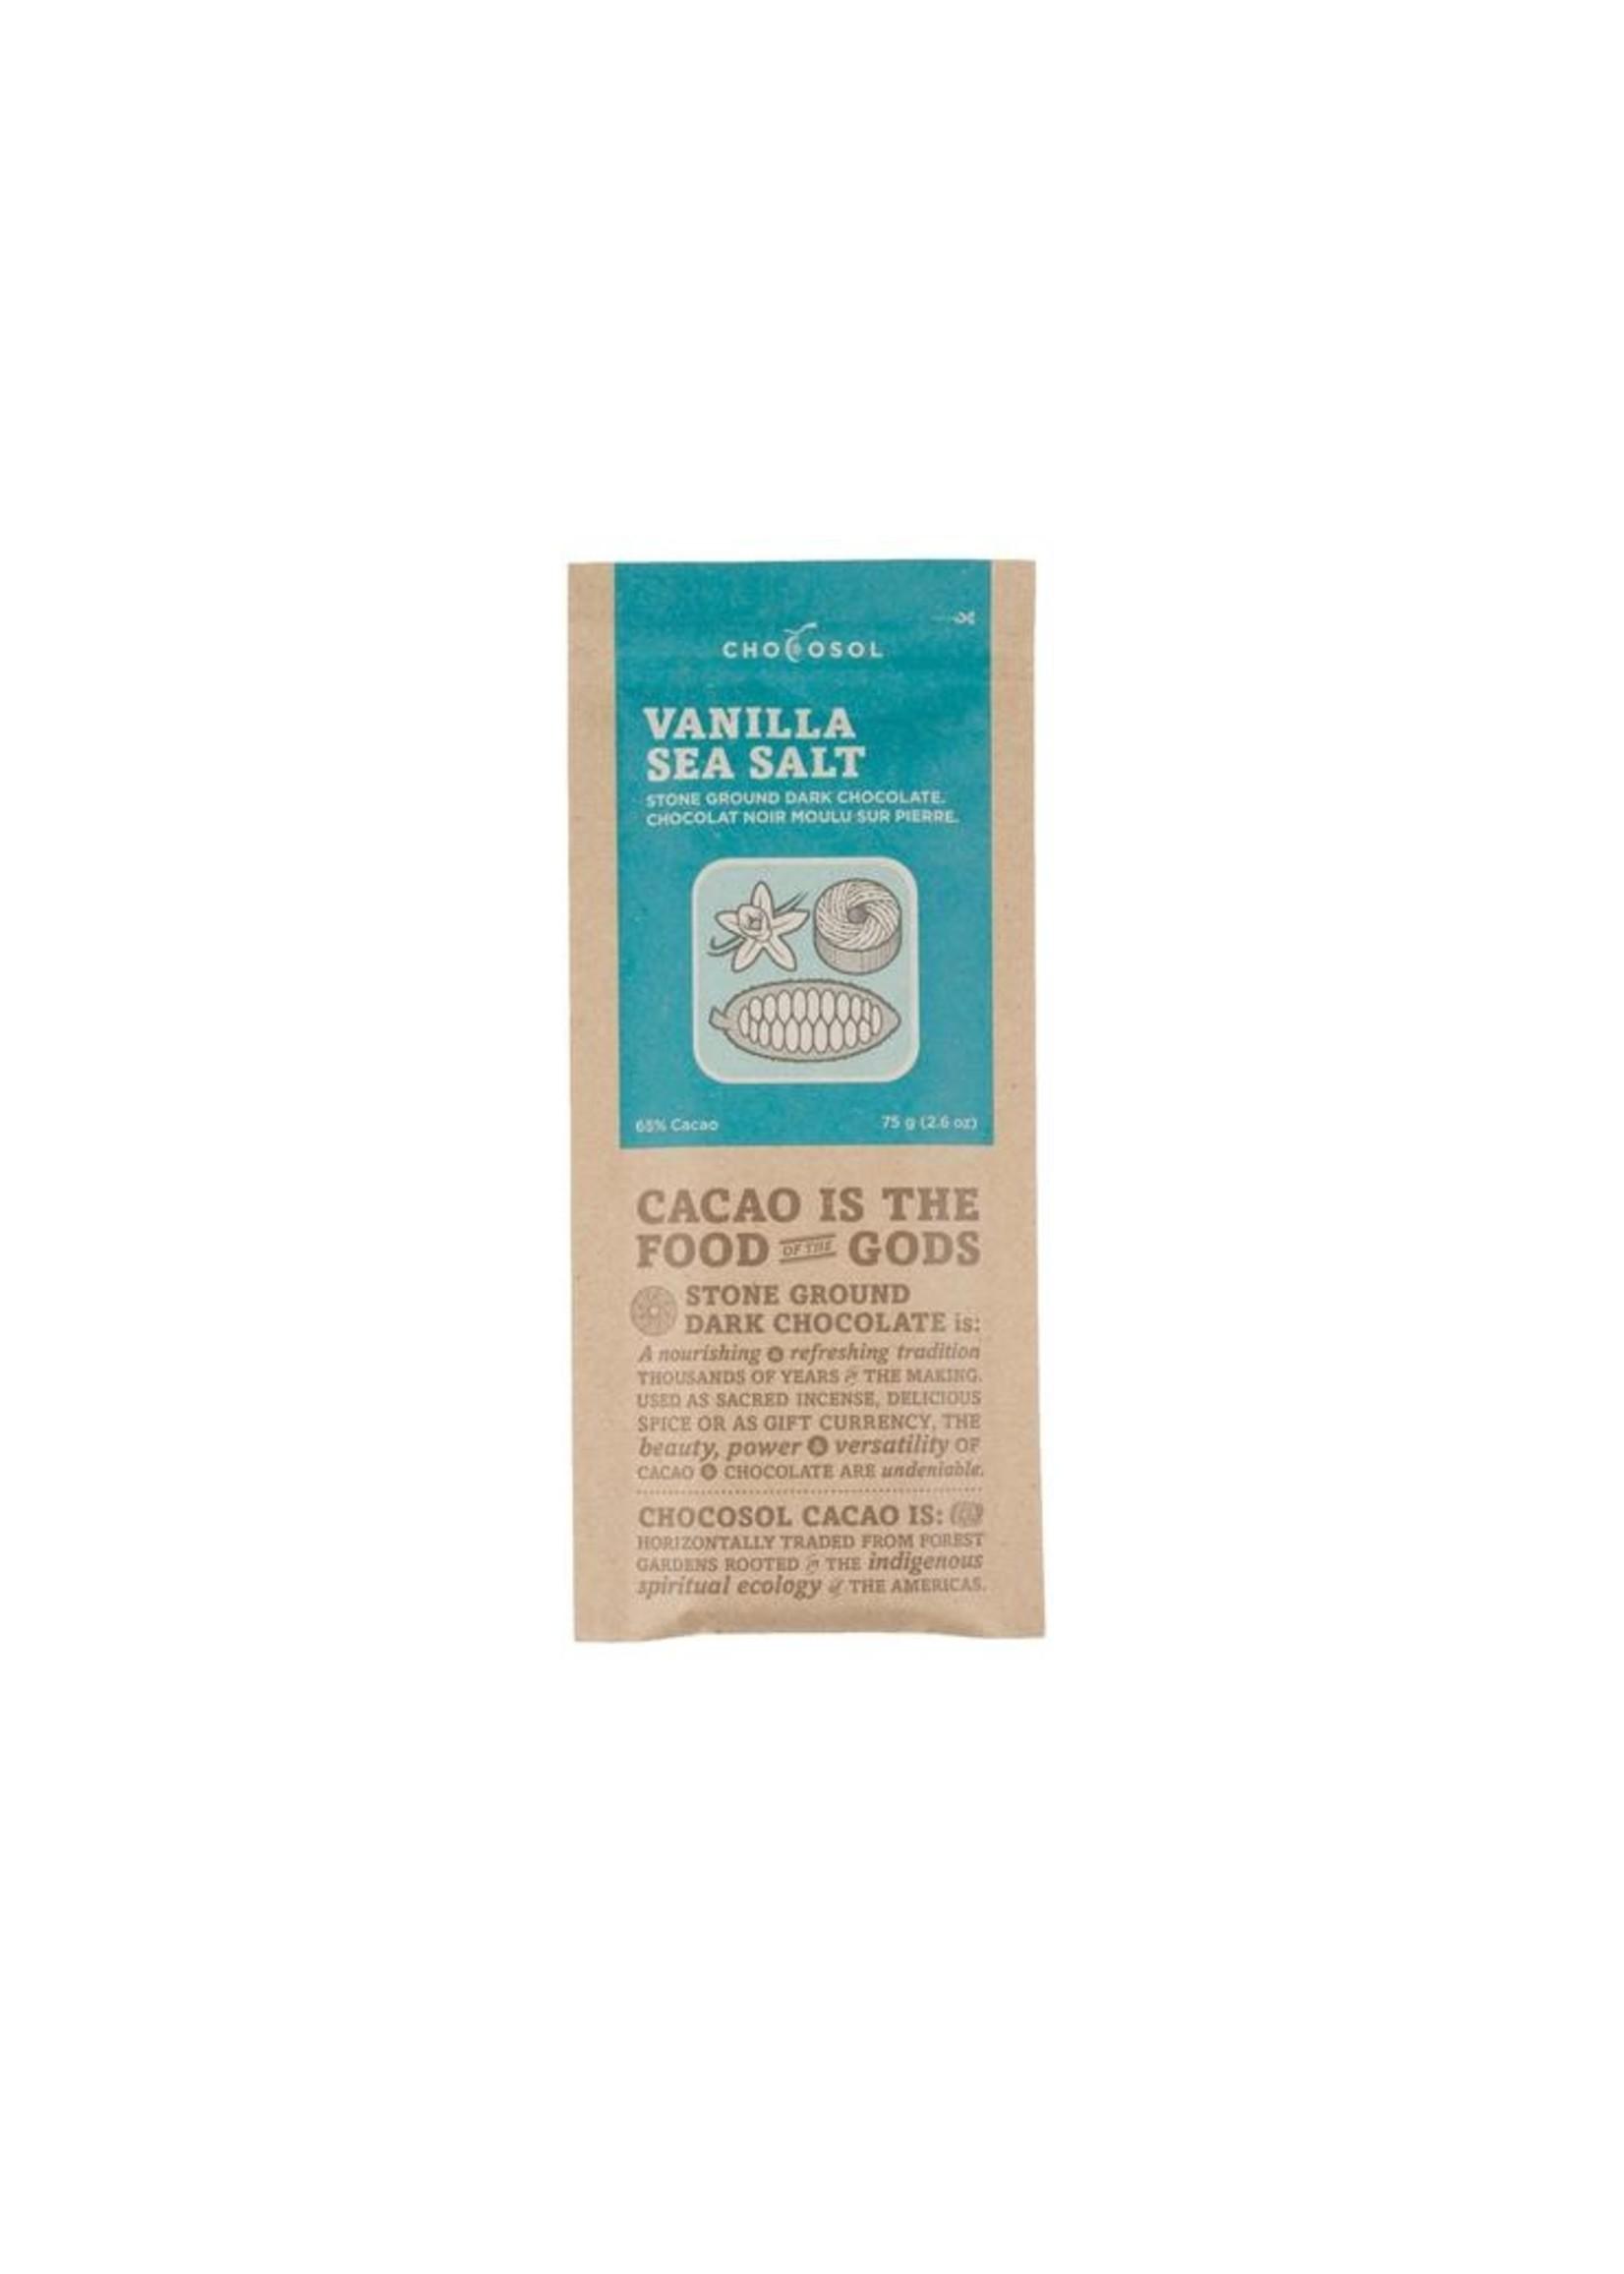 Chocosol Vanilla Sea Salt Chocosol